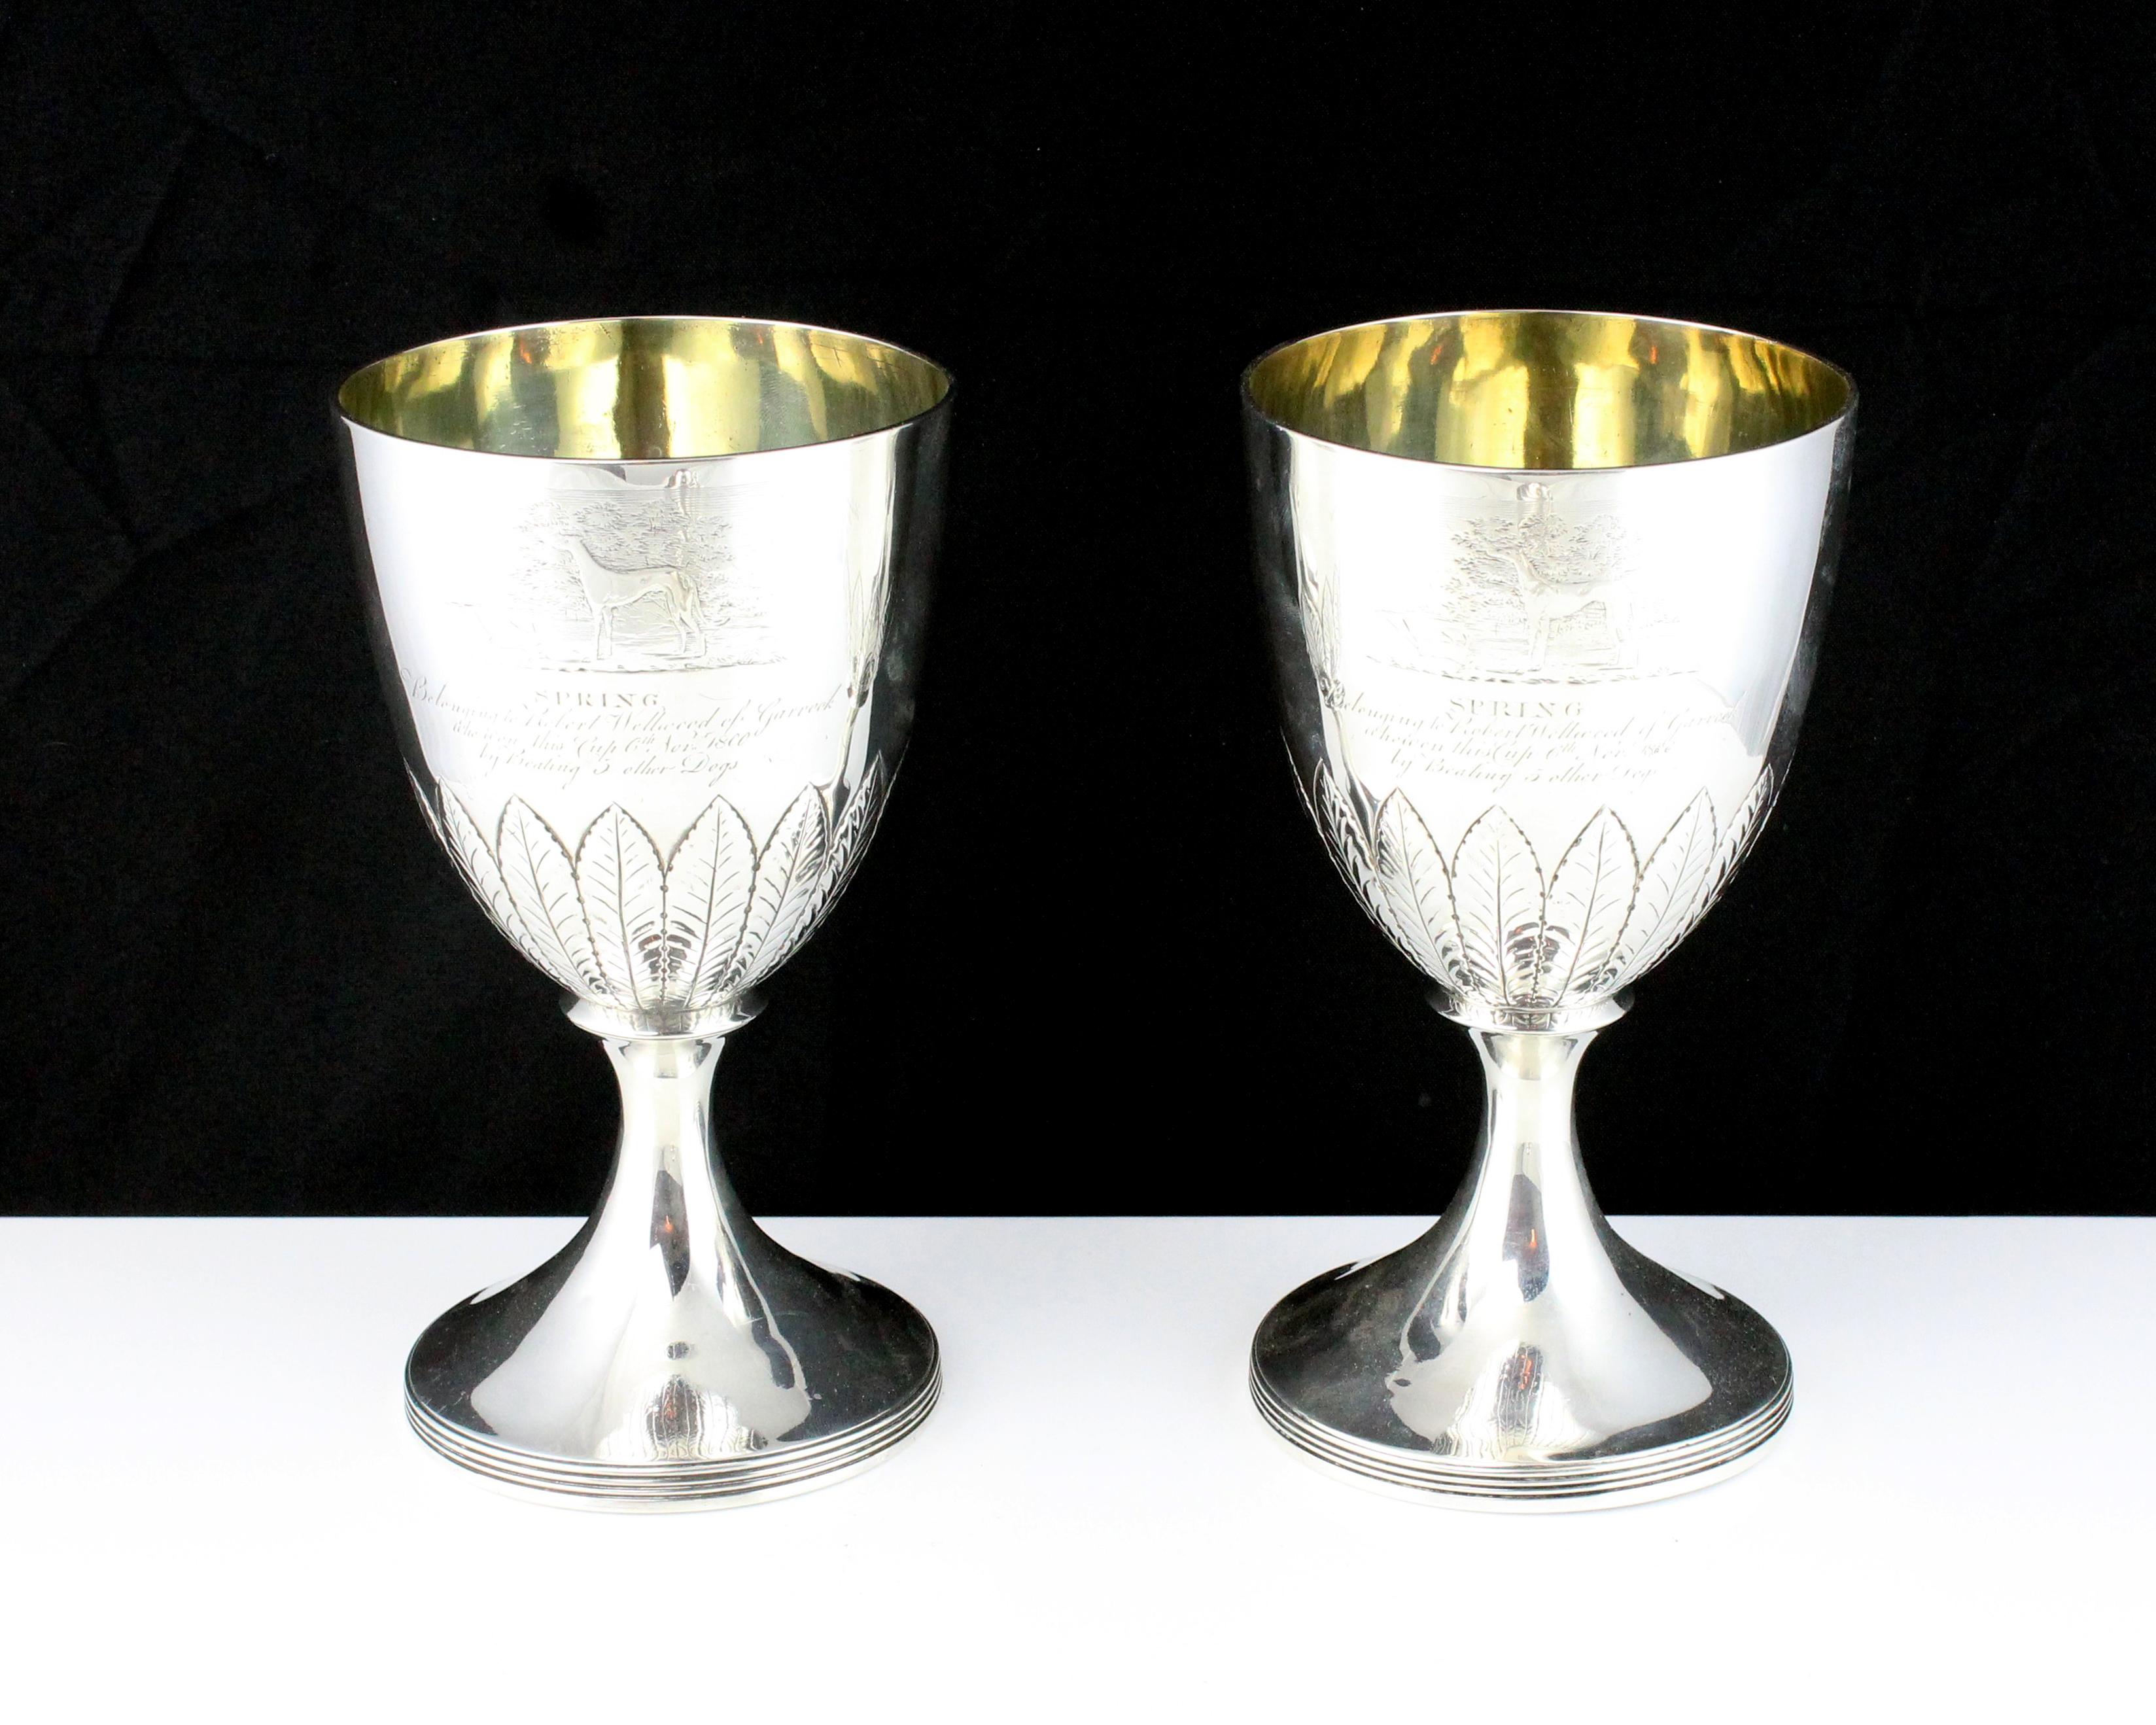 Los 57 - A pair of antique George III Scottish Sterling Silver goblets by McHattie & Fenwick, Edinburgh